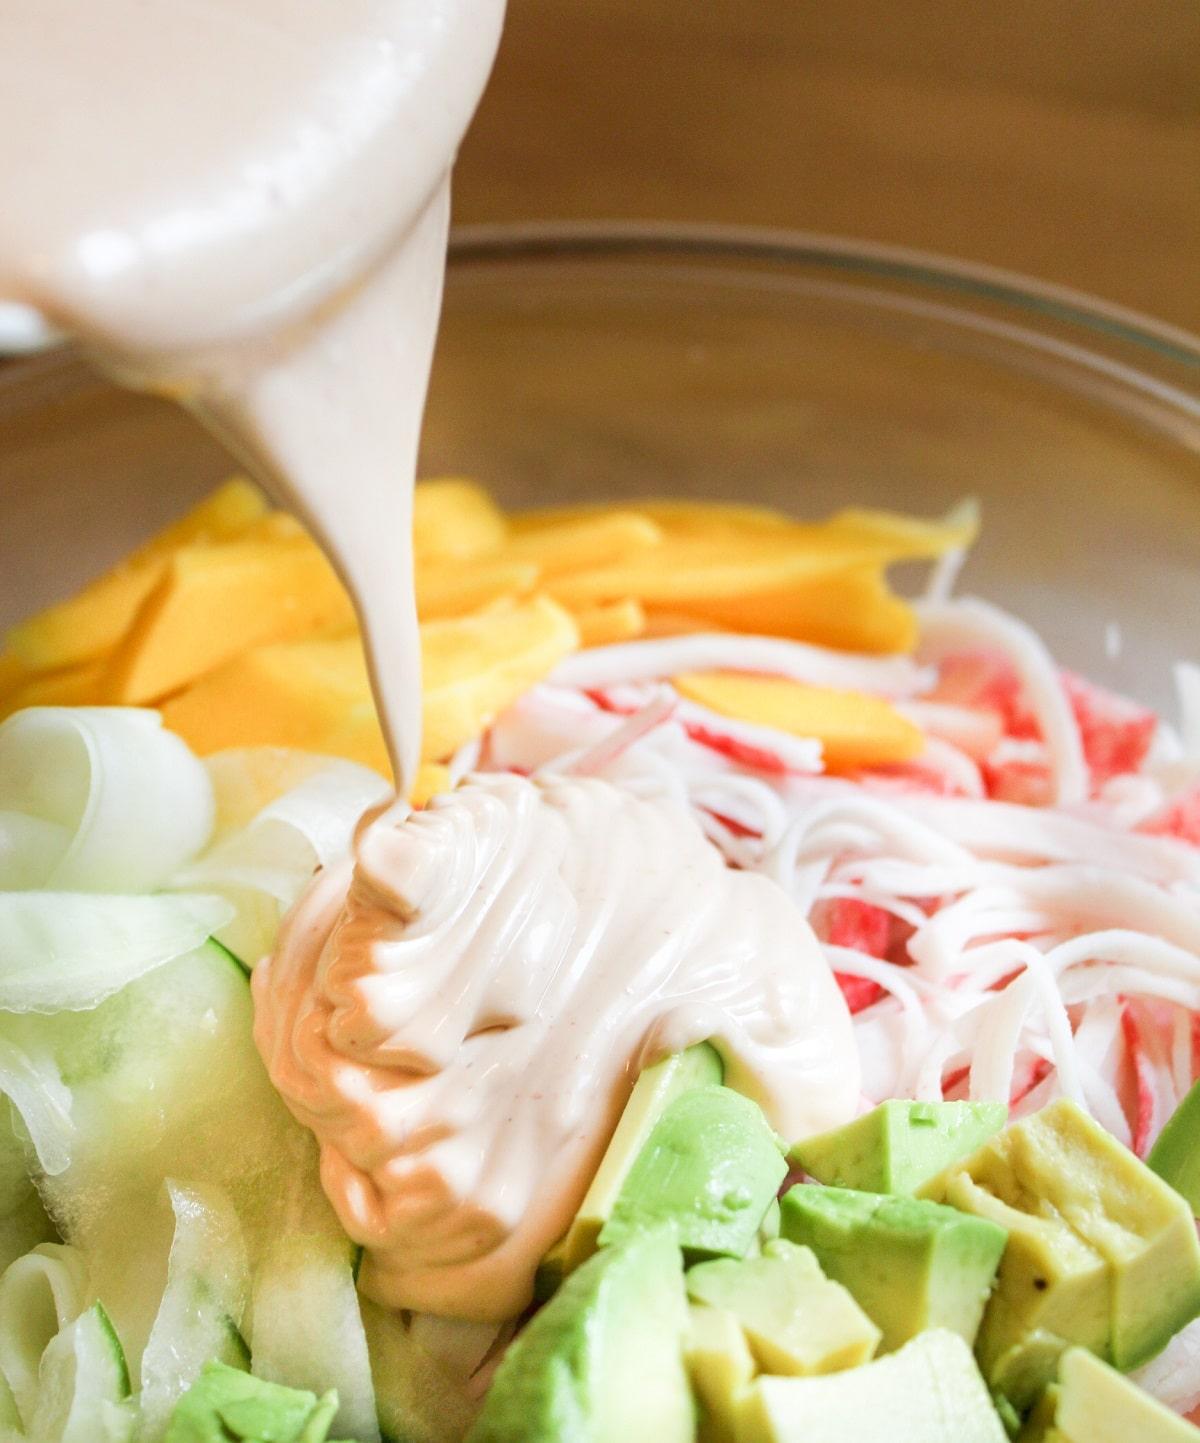 dressig poured over the kani salad